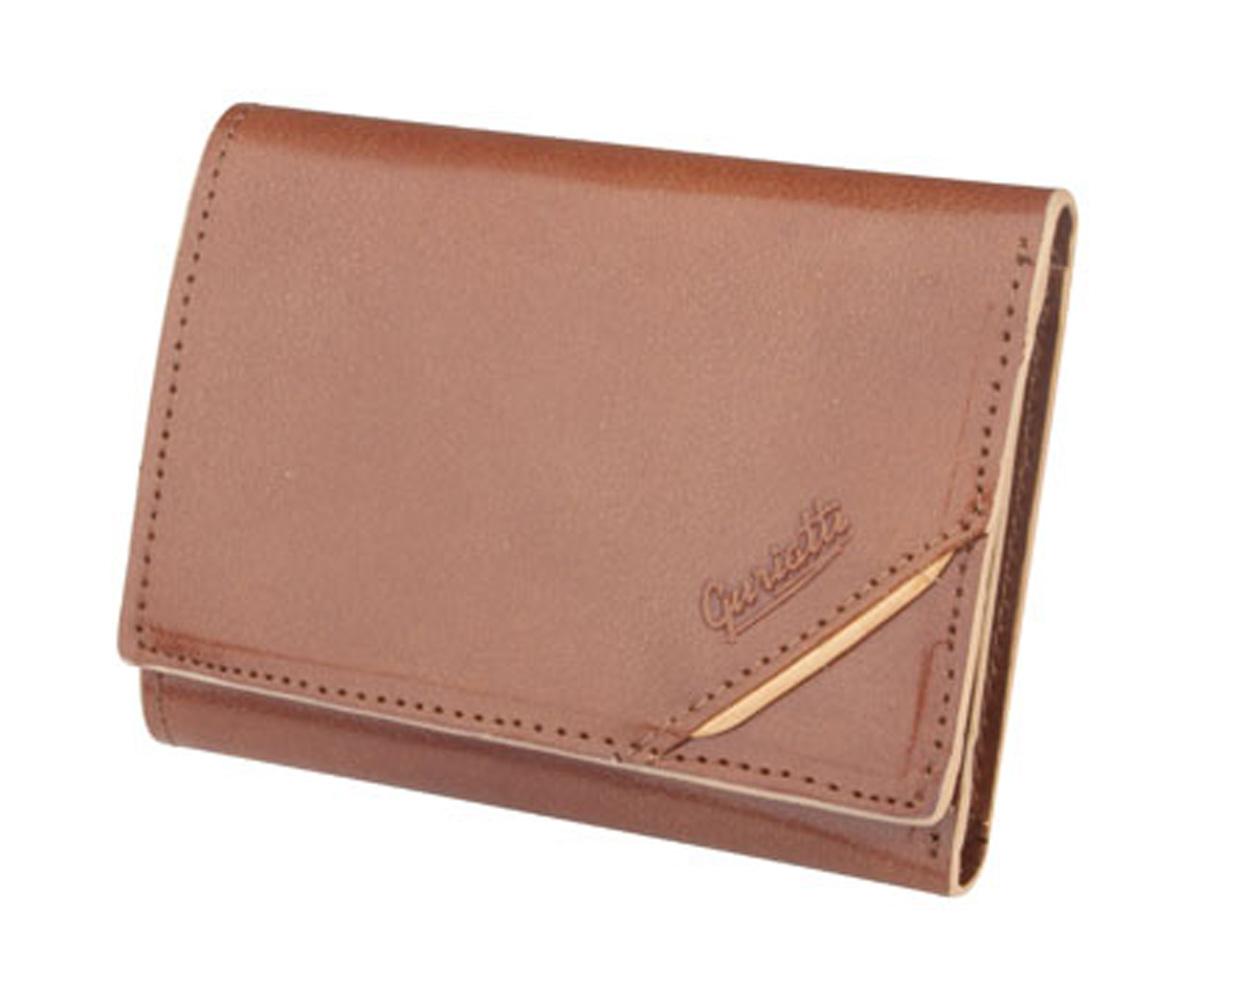 Raro unisex wallet